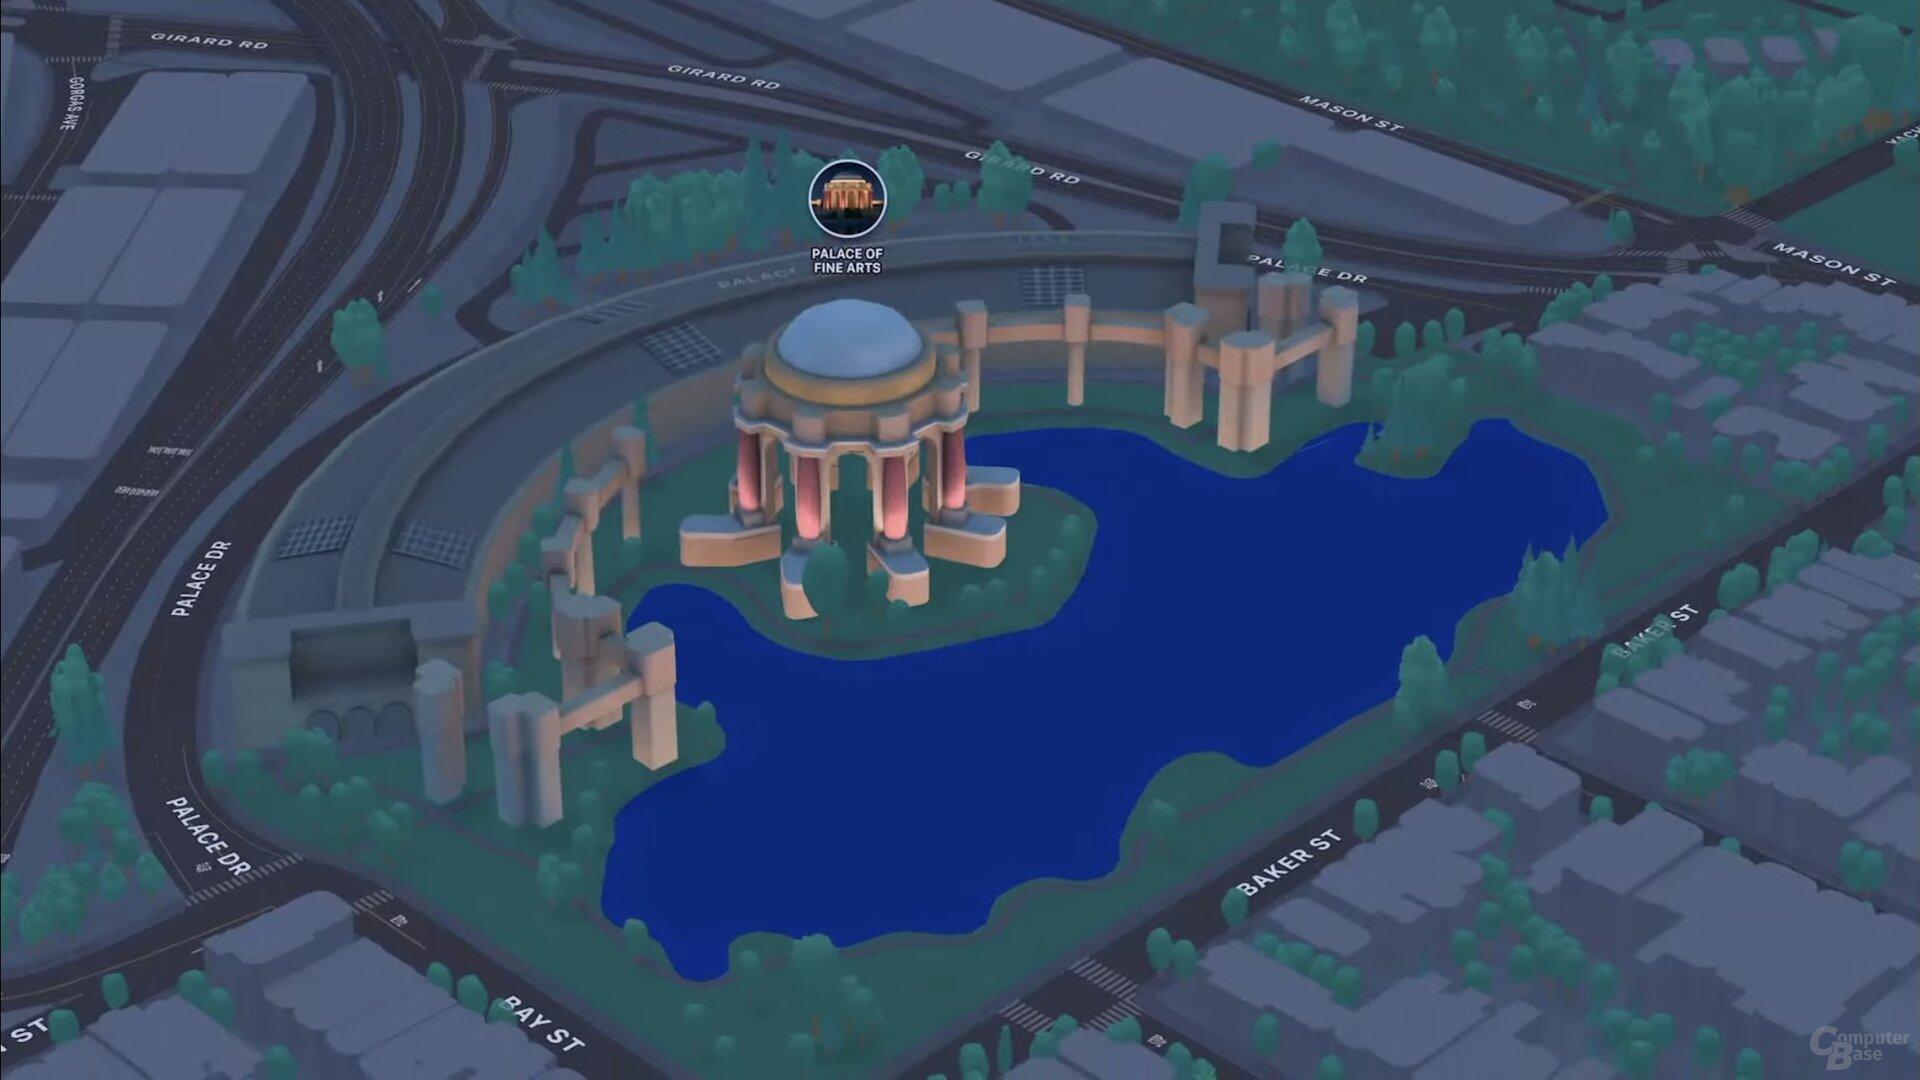 SF Palace of Fine Arts (iOS 15)